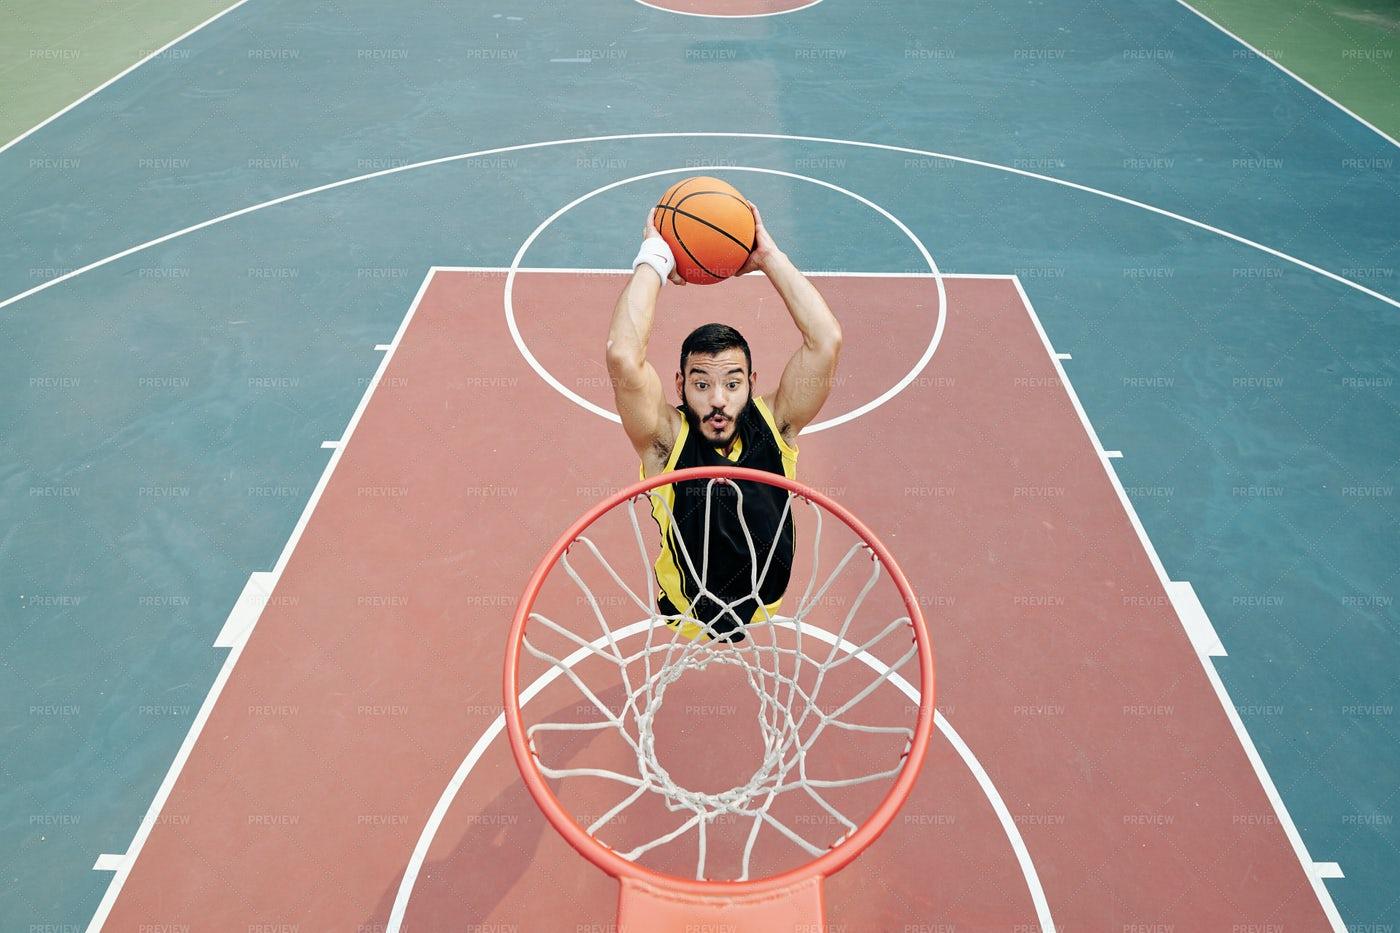 Player Throwing Ball In Basket: Stock Photos